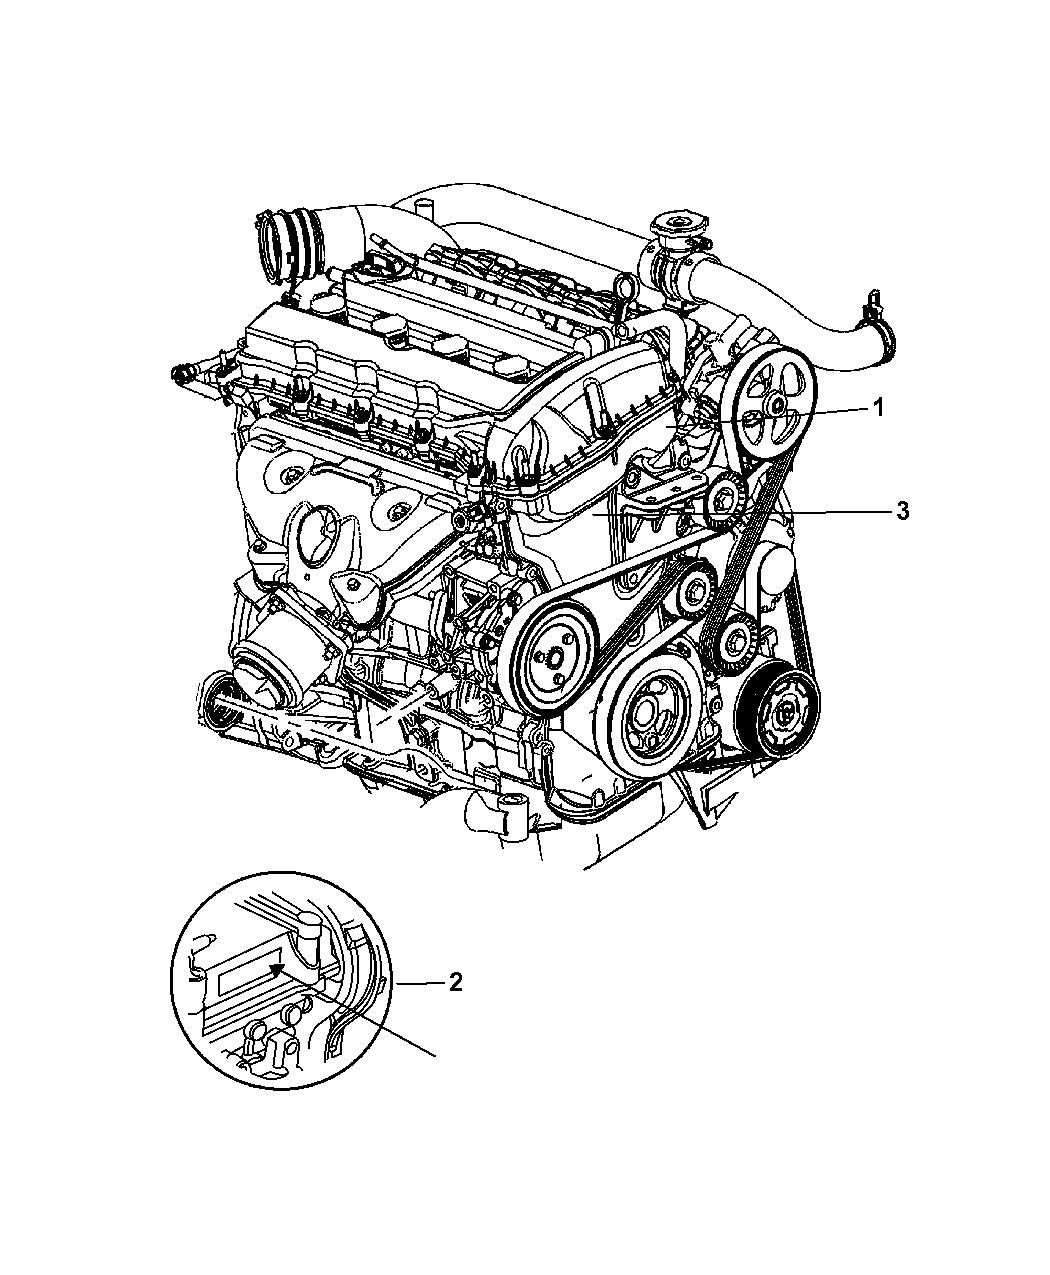 2011 Chrysler 200 Engine Assembly & Service - Thumbnail 1